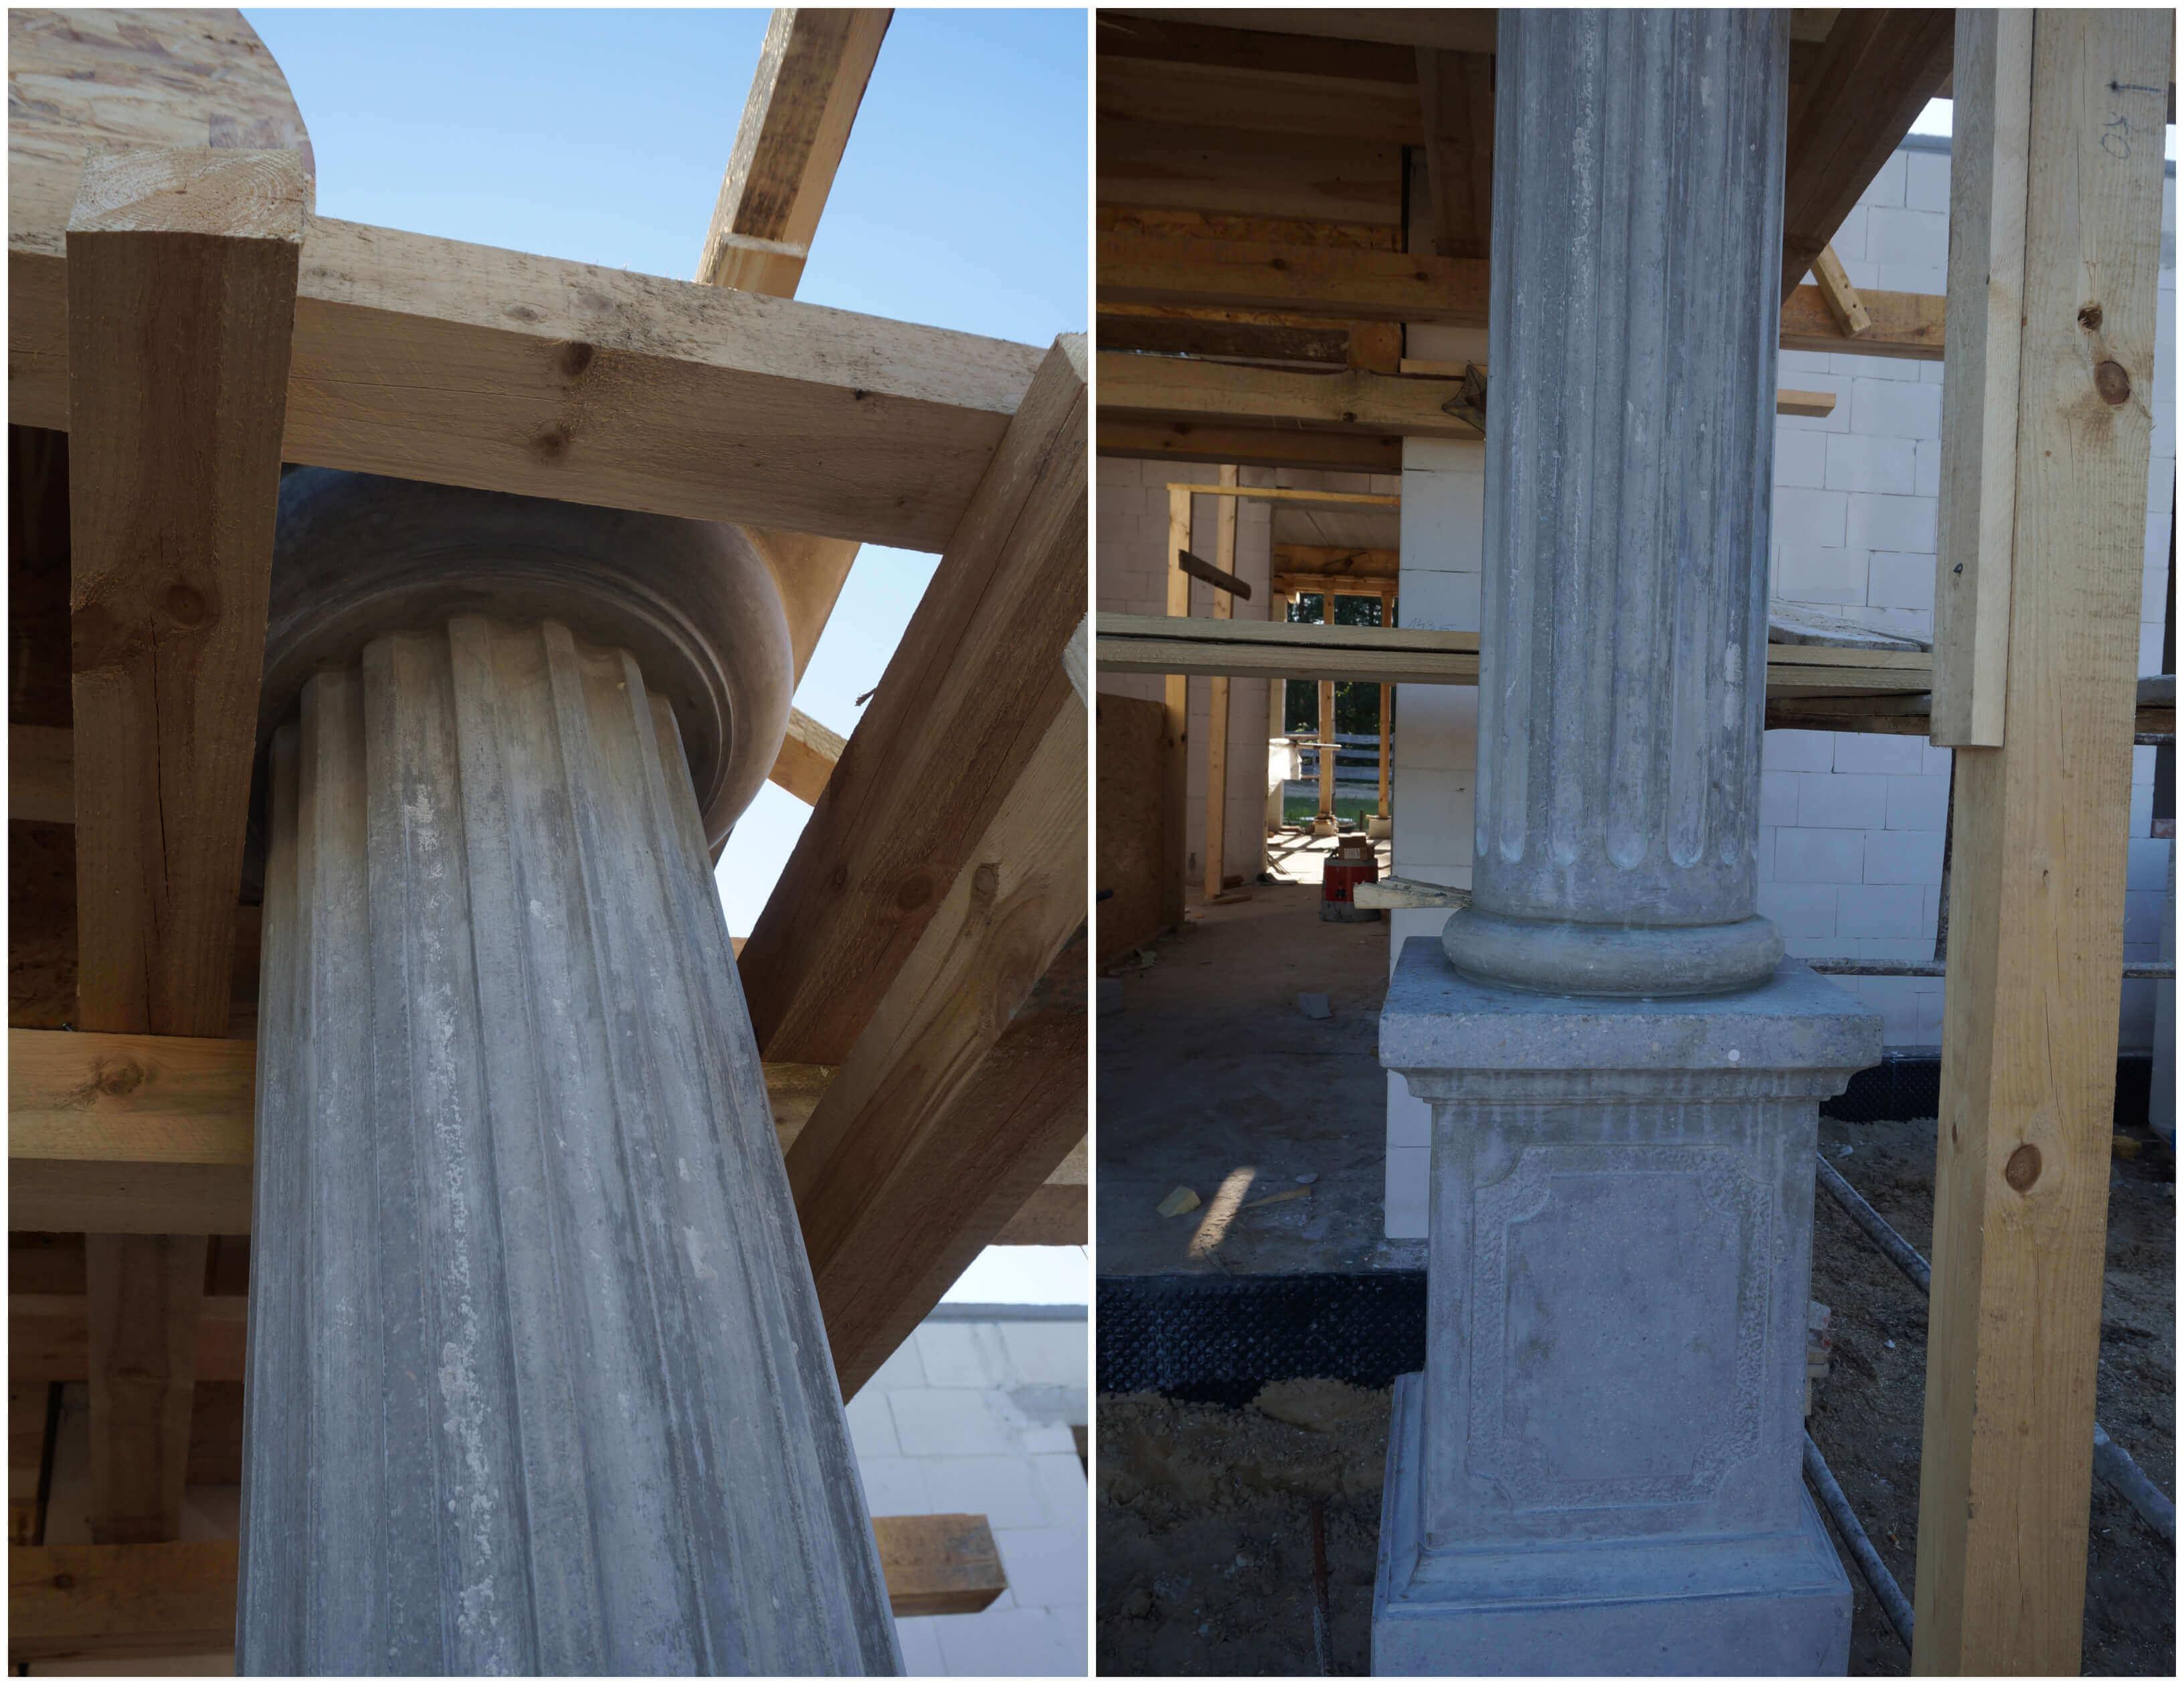 dworek kolumny monolit 2